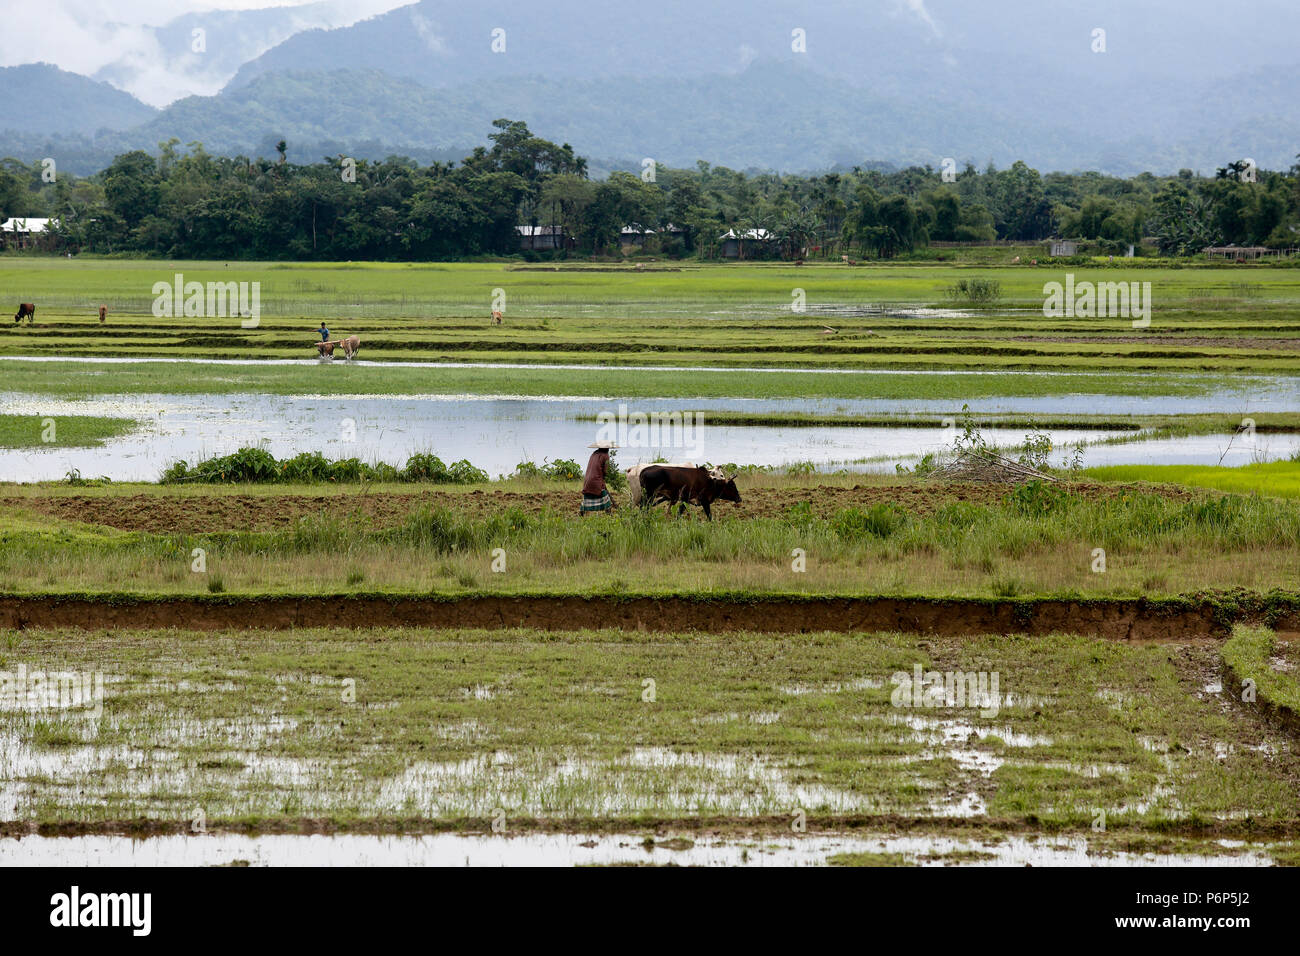 Landscape of Goainghat, Sylhet, Bangladesh. - Stock Image